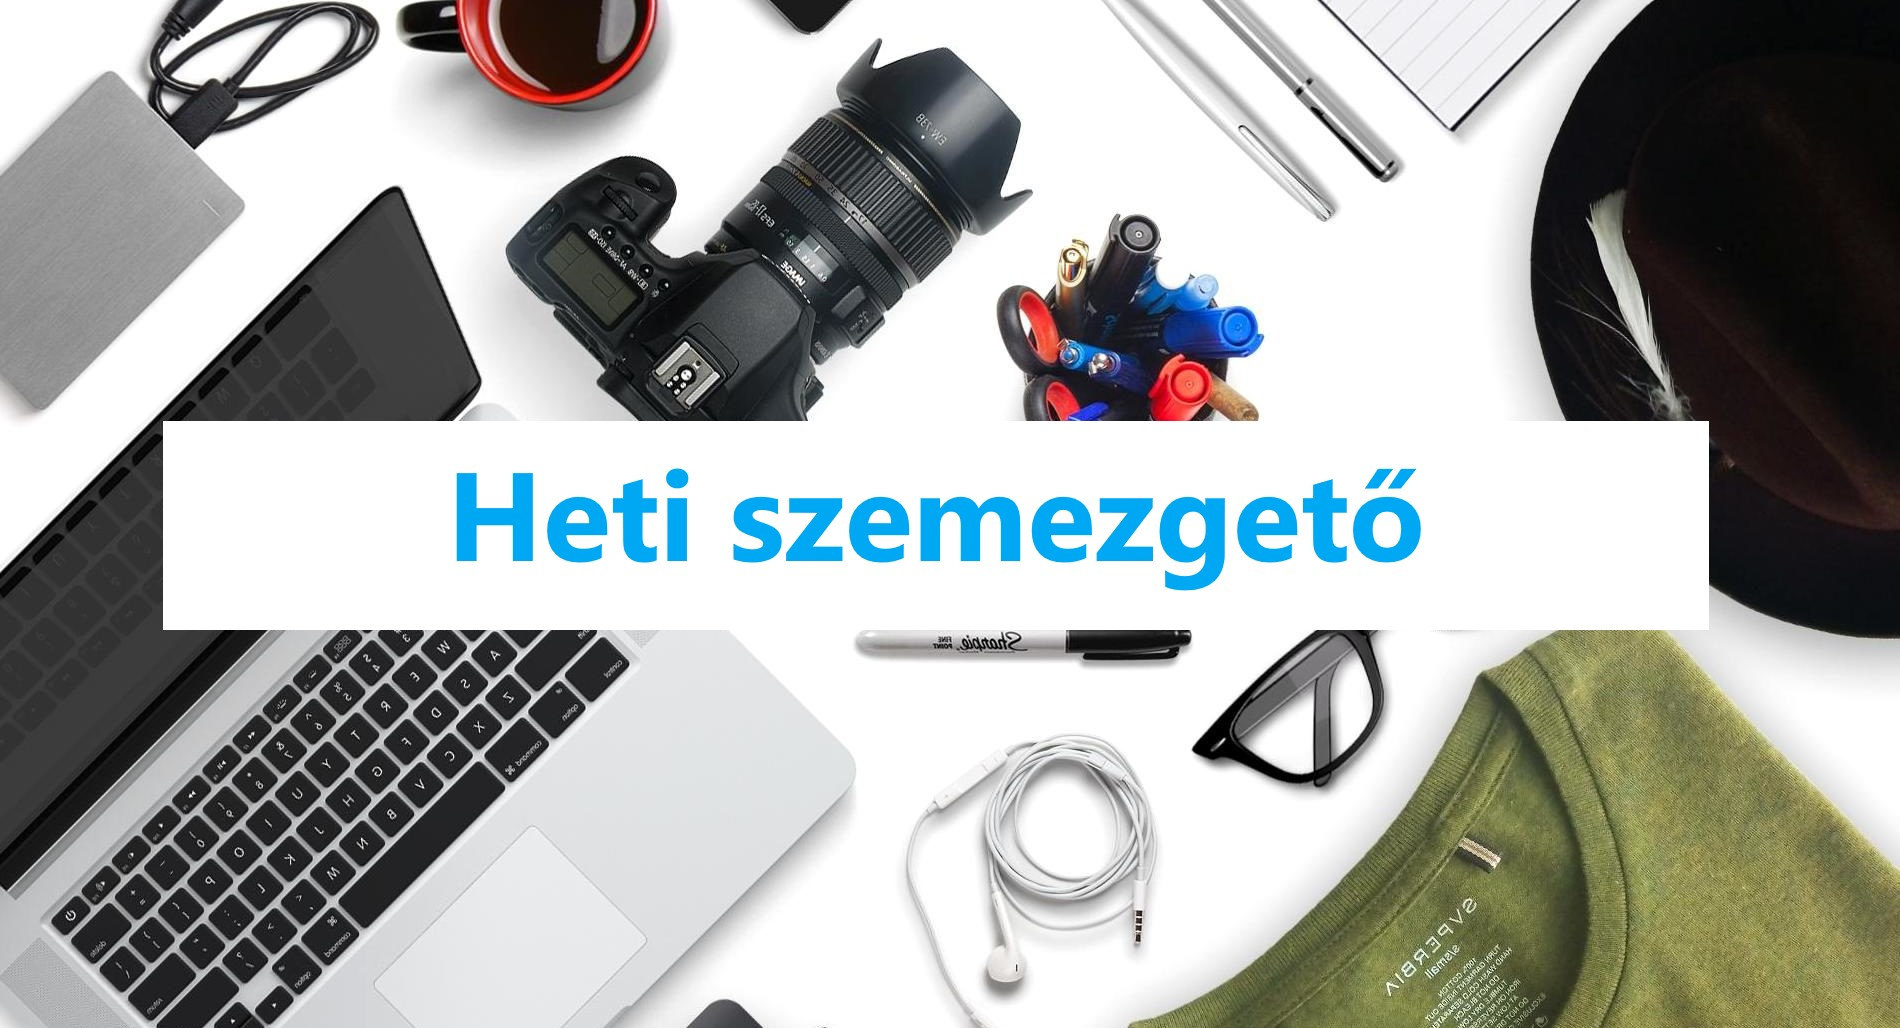 heti_szemezgeto_uj_34.jpg